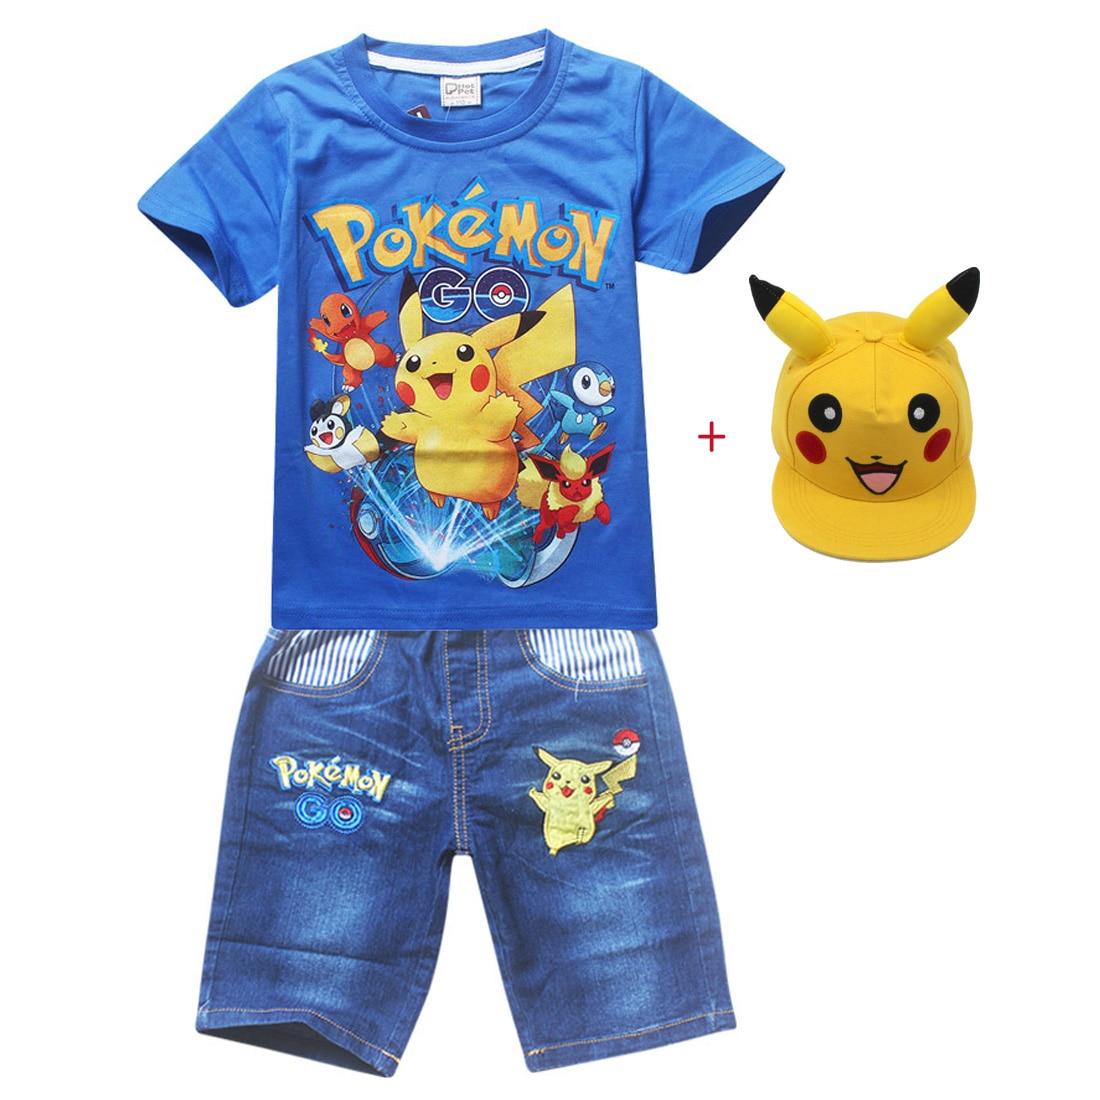 Kids Pokemon Summer Boy Cotton Clothing Sets Pokemon Short Sleeve T-Shirt Jeans Set Boys Cartoon Pikaqiu Baby Sport Pikachu Suit